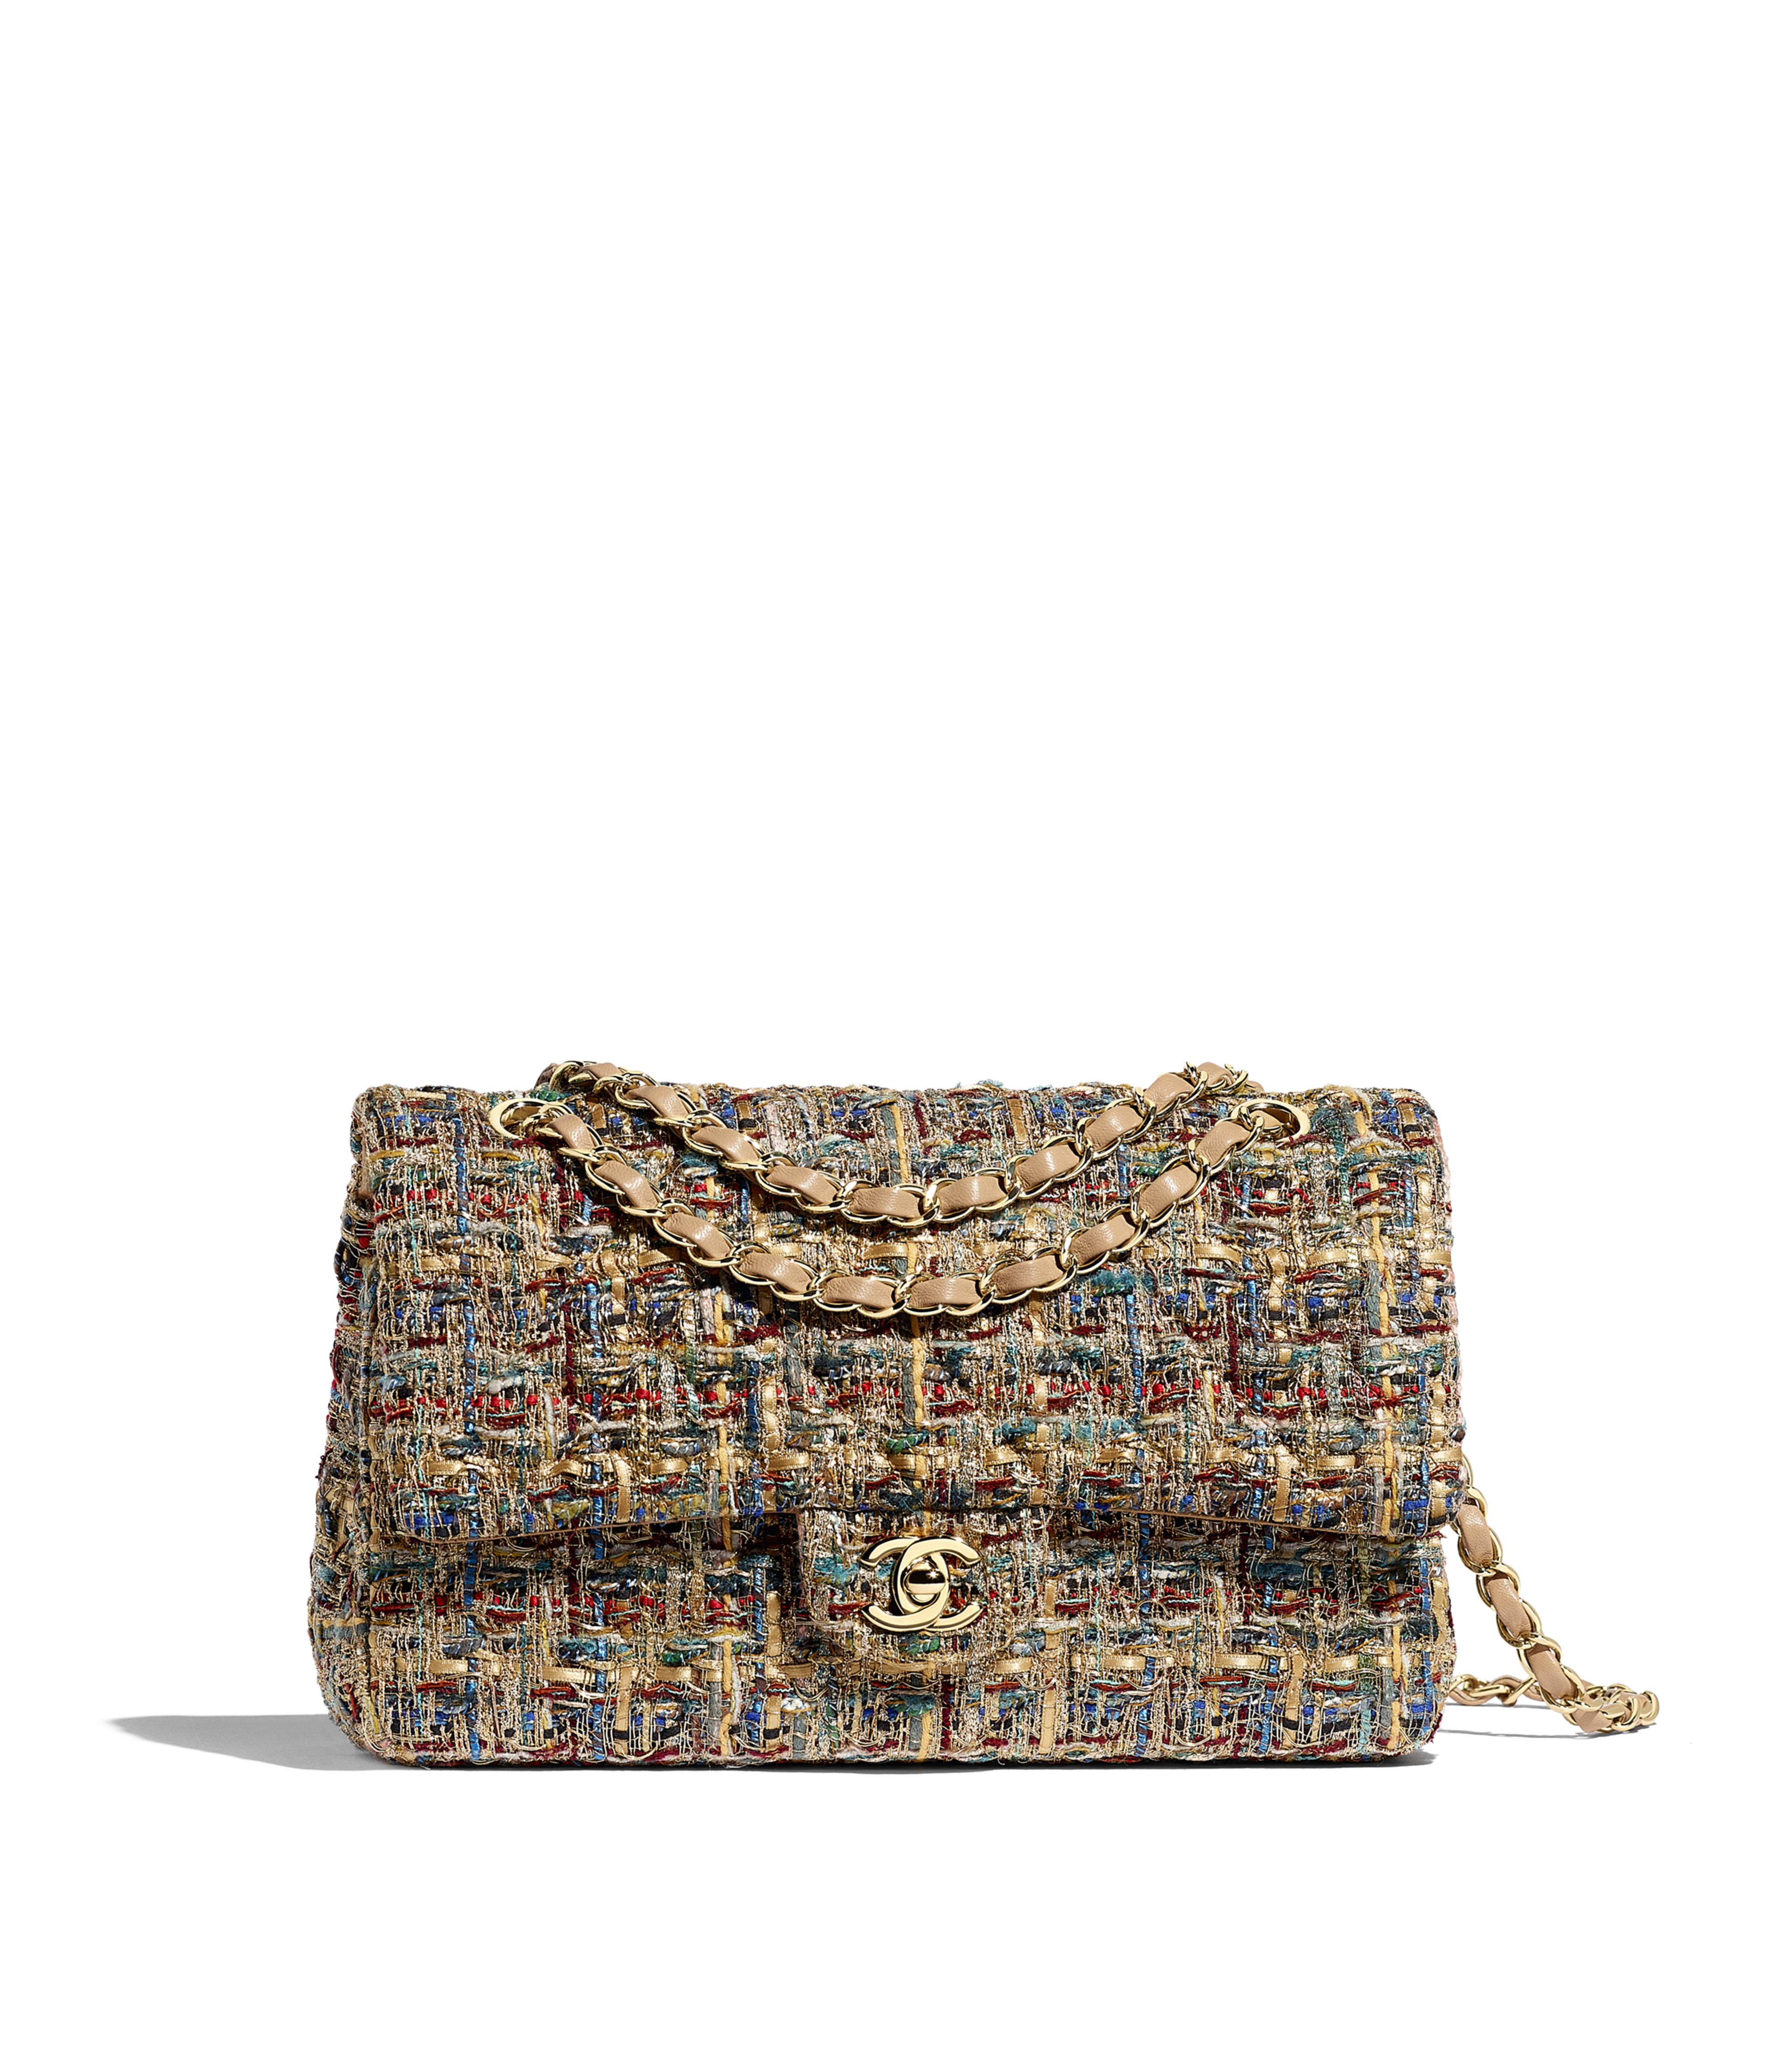 cdd3726ba5cf34 Classic Handbag Tweed & Gold-Tone Metal, Gold, Blue & Green Ref.  A01112B01026MG529